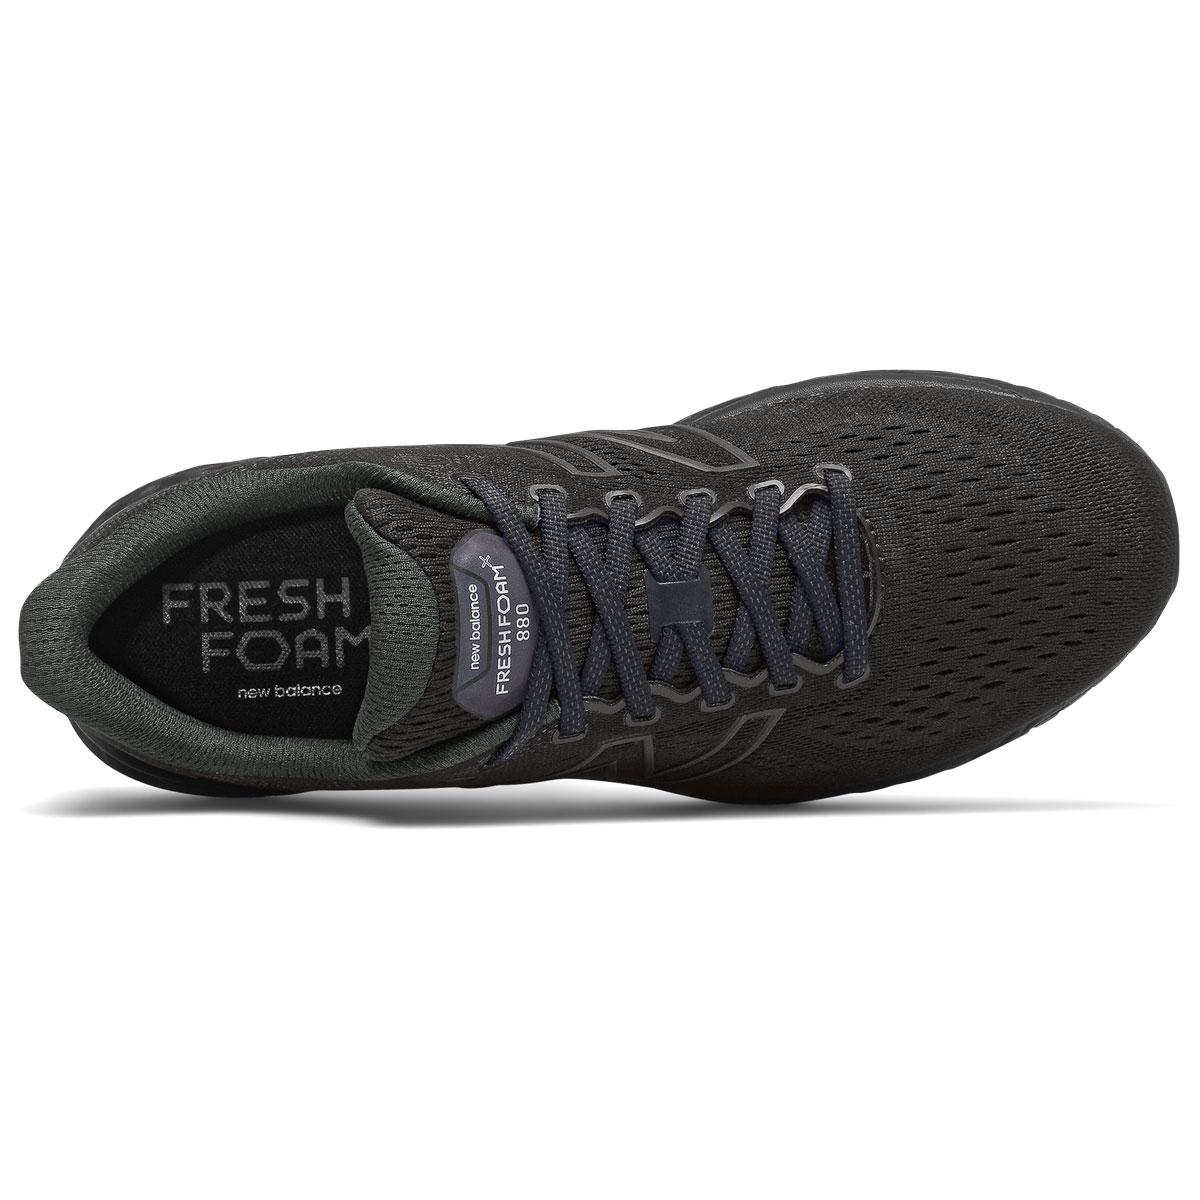 Men's New Balance Fresh Foam 880v11 Running Shoe - Color: Black/Phantom - Size: 6 - Width: Wide, Black/Phantom, large, image 3